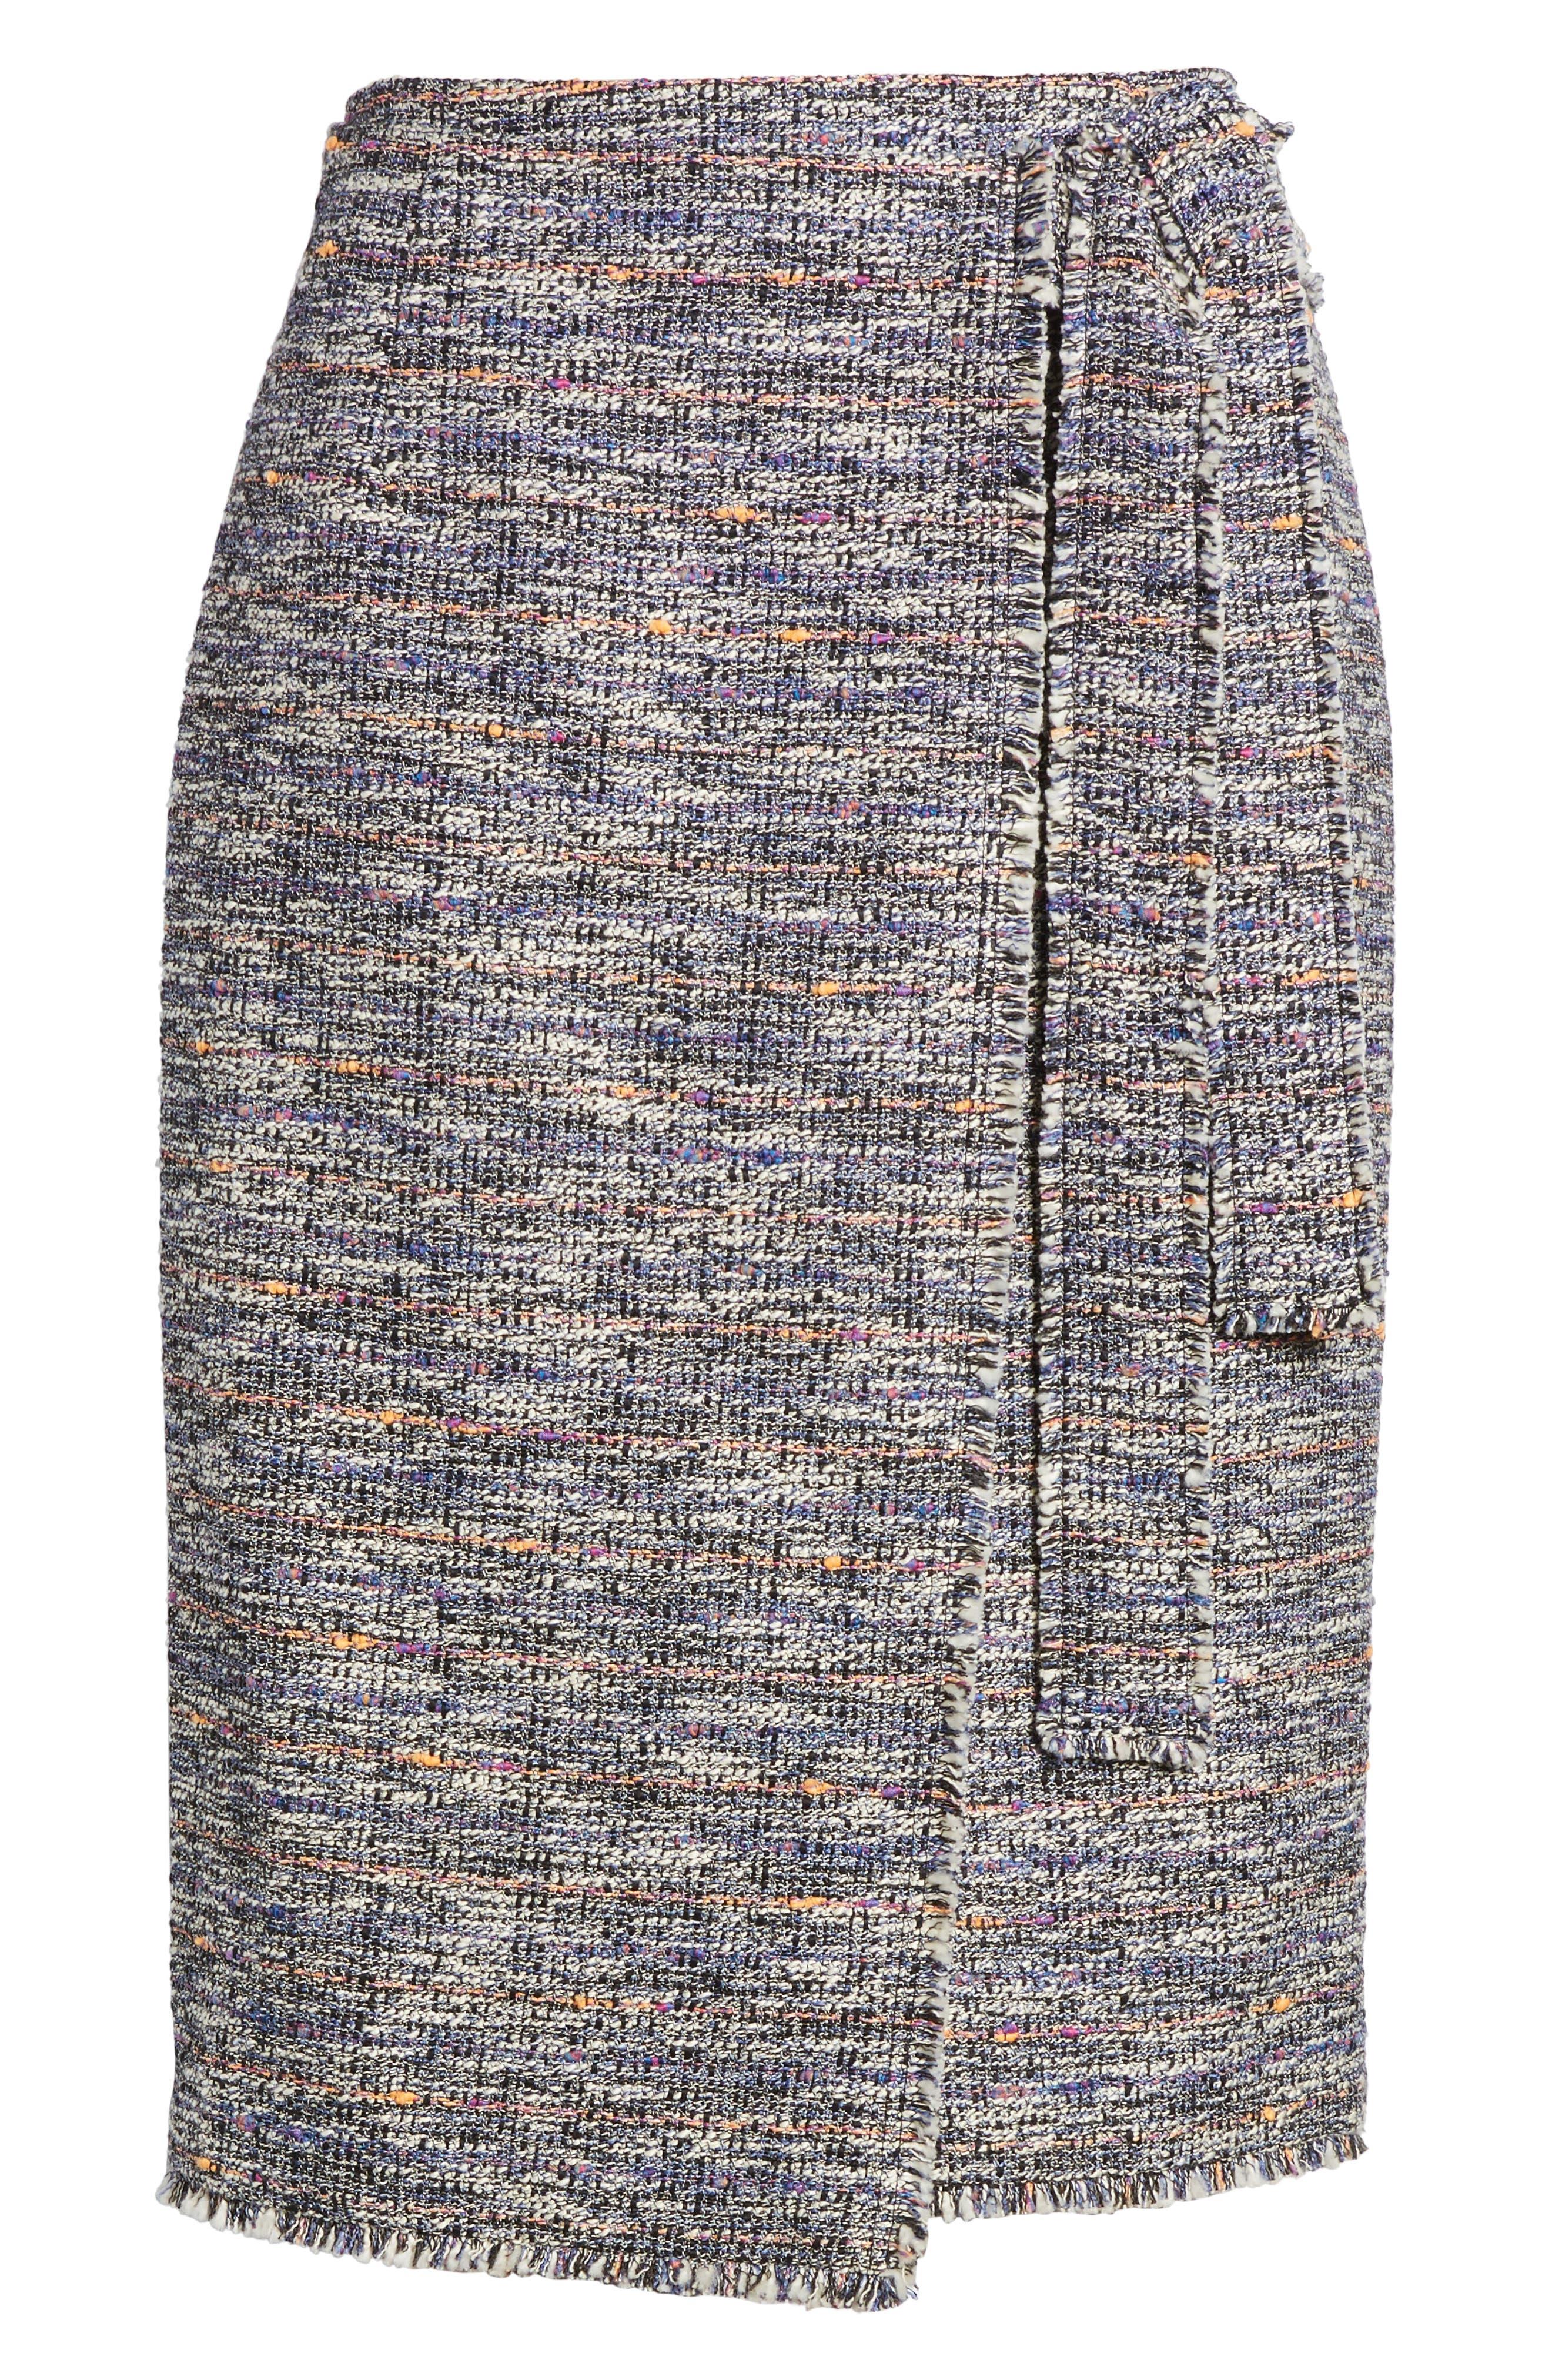 Tie Detail Pencil Skirt,                             Alternate thumbnail 6, color,                             Black Multi Tweed